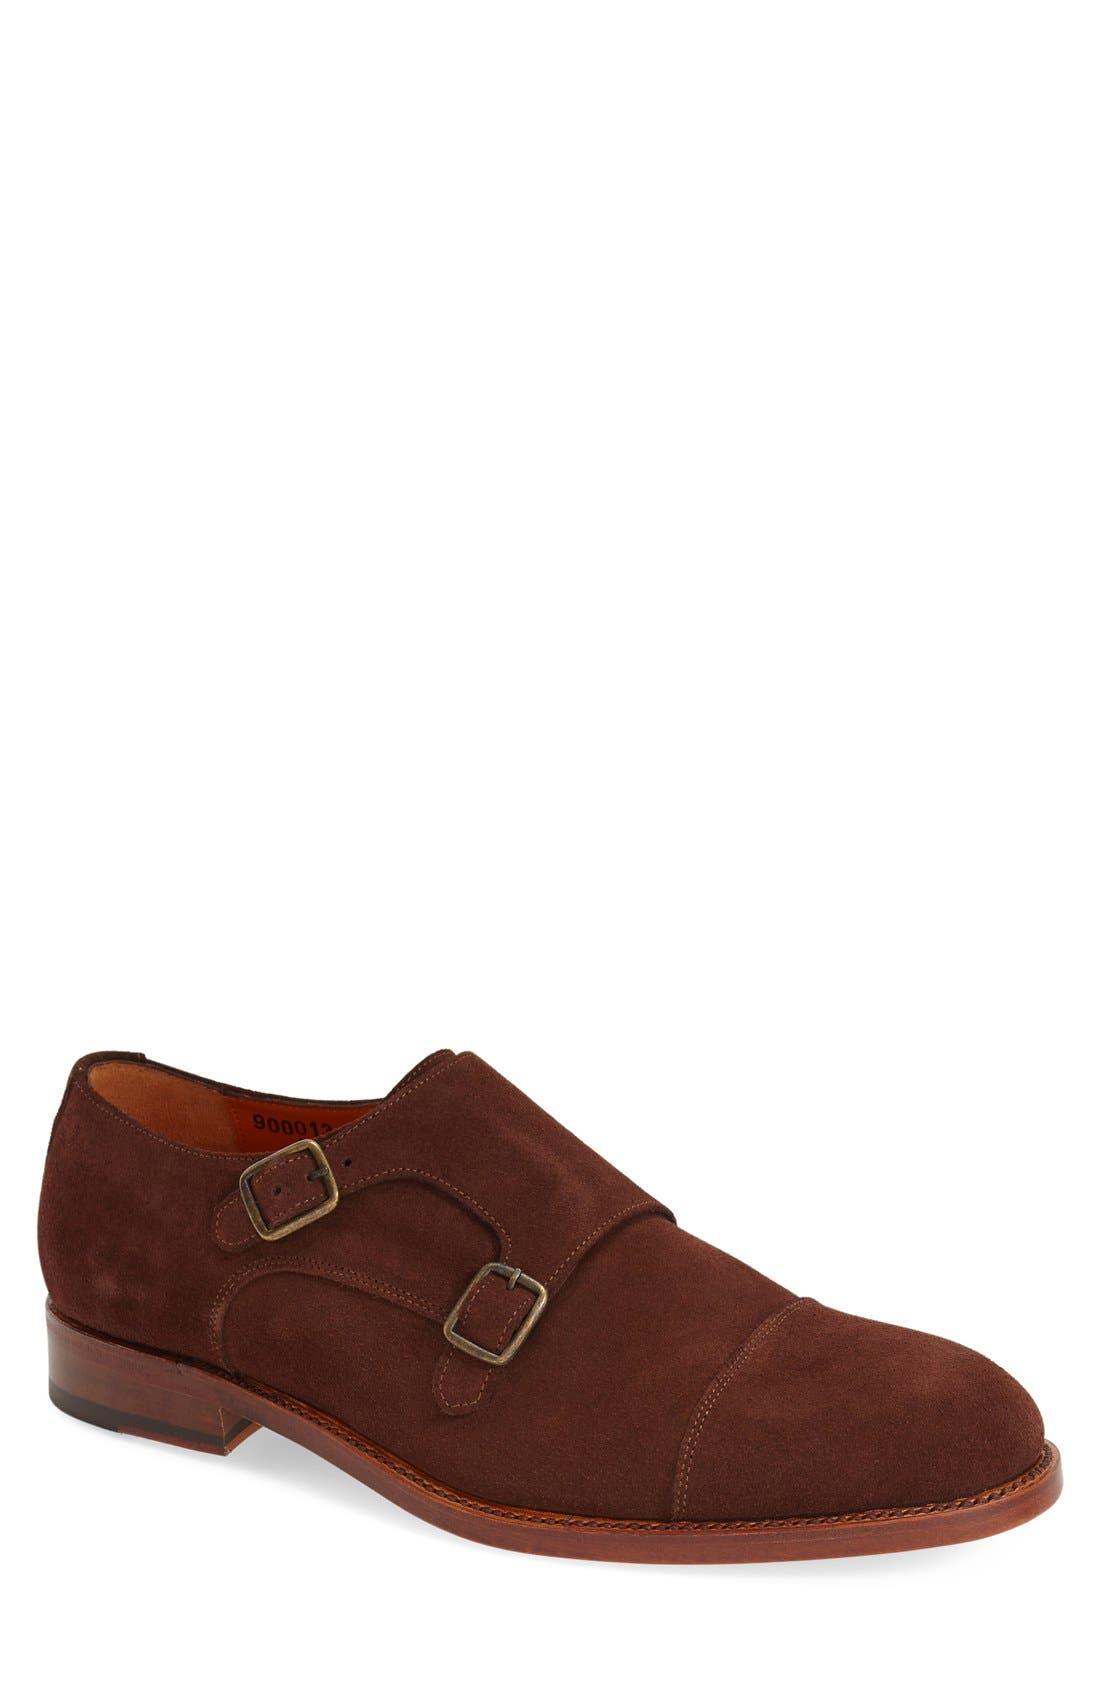 Main Image - Crosby Square 'Diplomat' Double Monk Strap Shoe (Men)